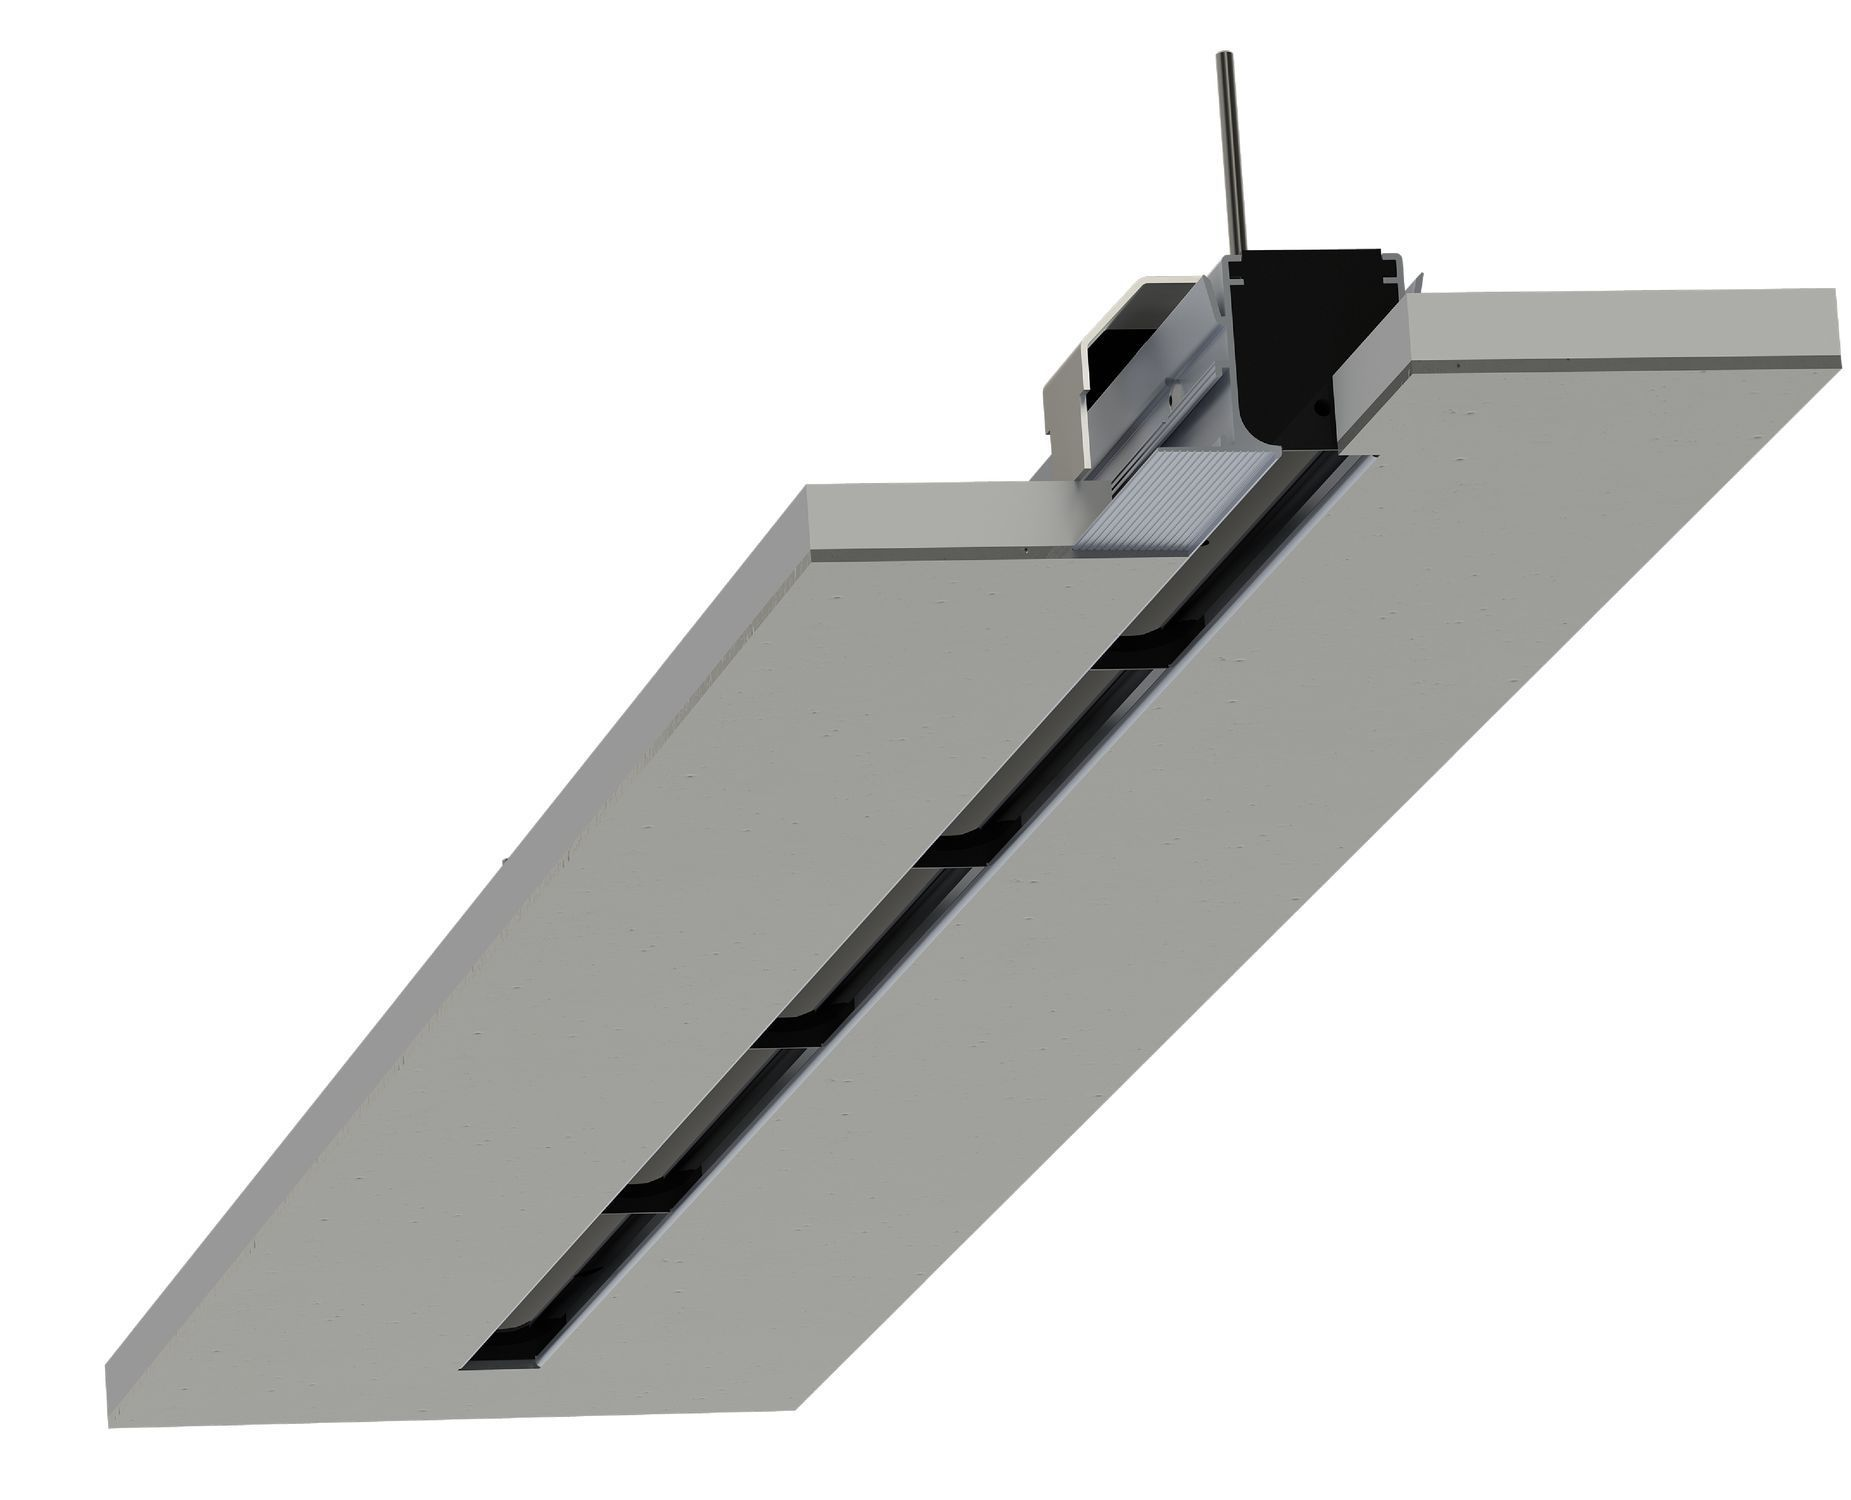 Linear Ceiling Grills : Ceiling air diffuser linear slot dsc plaster schako